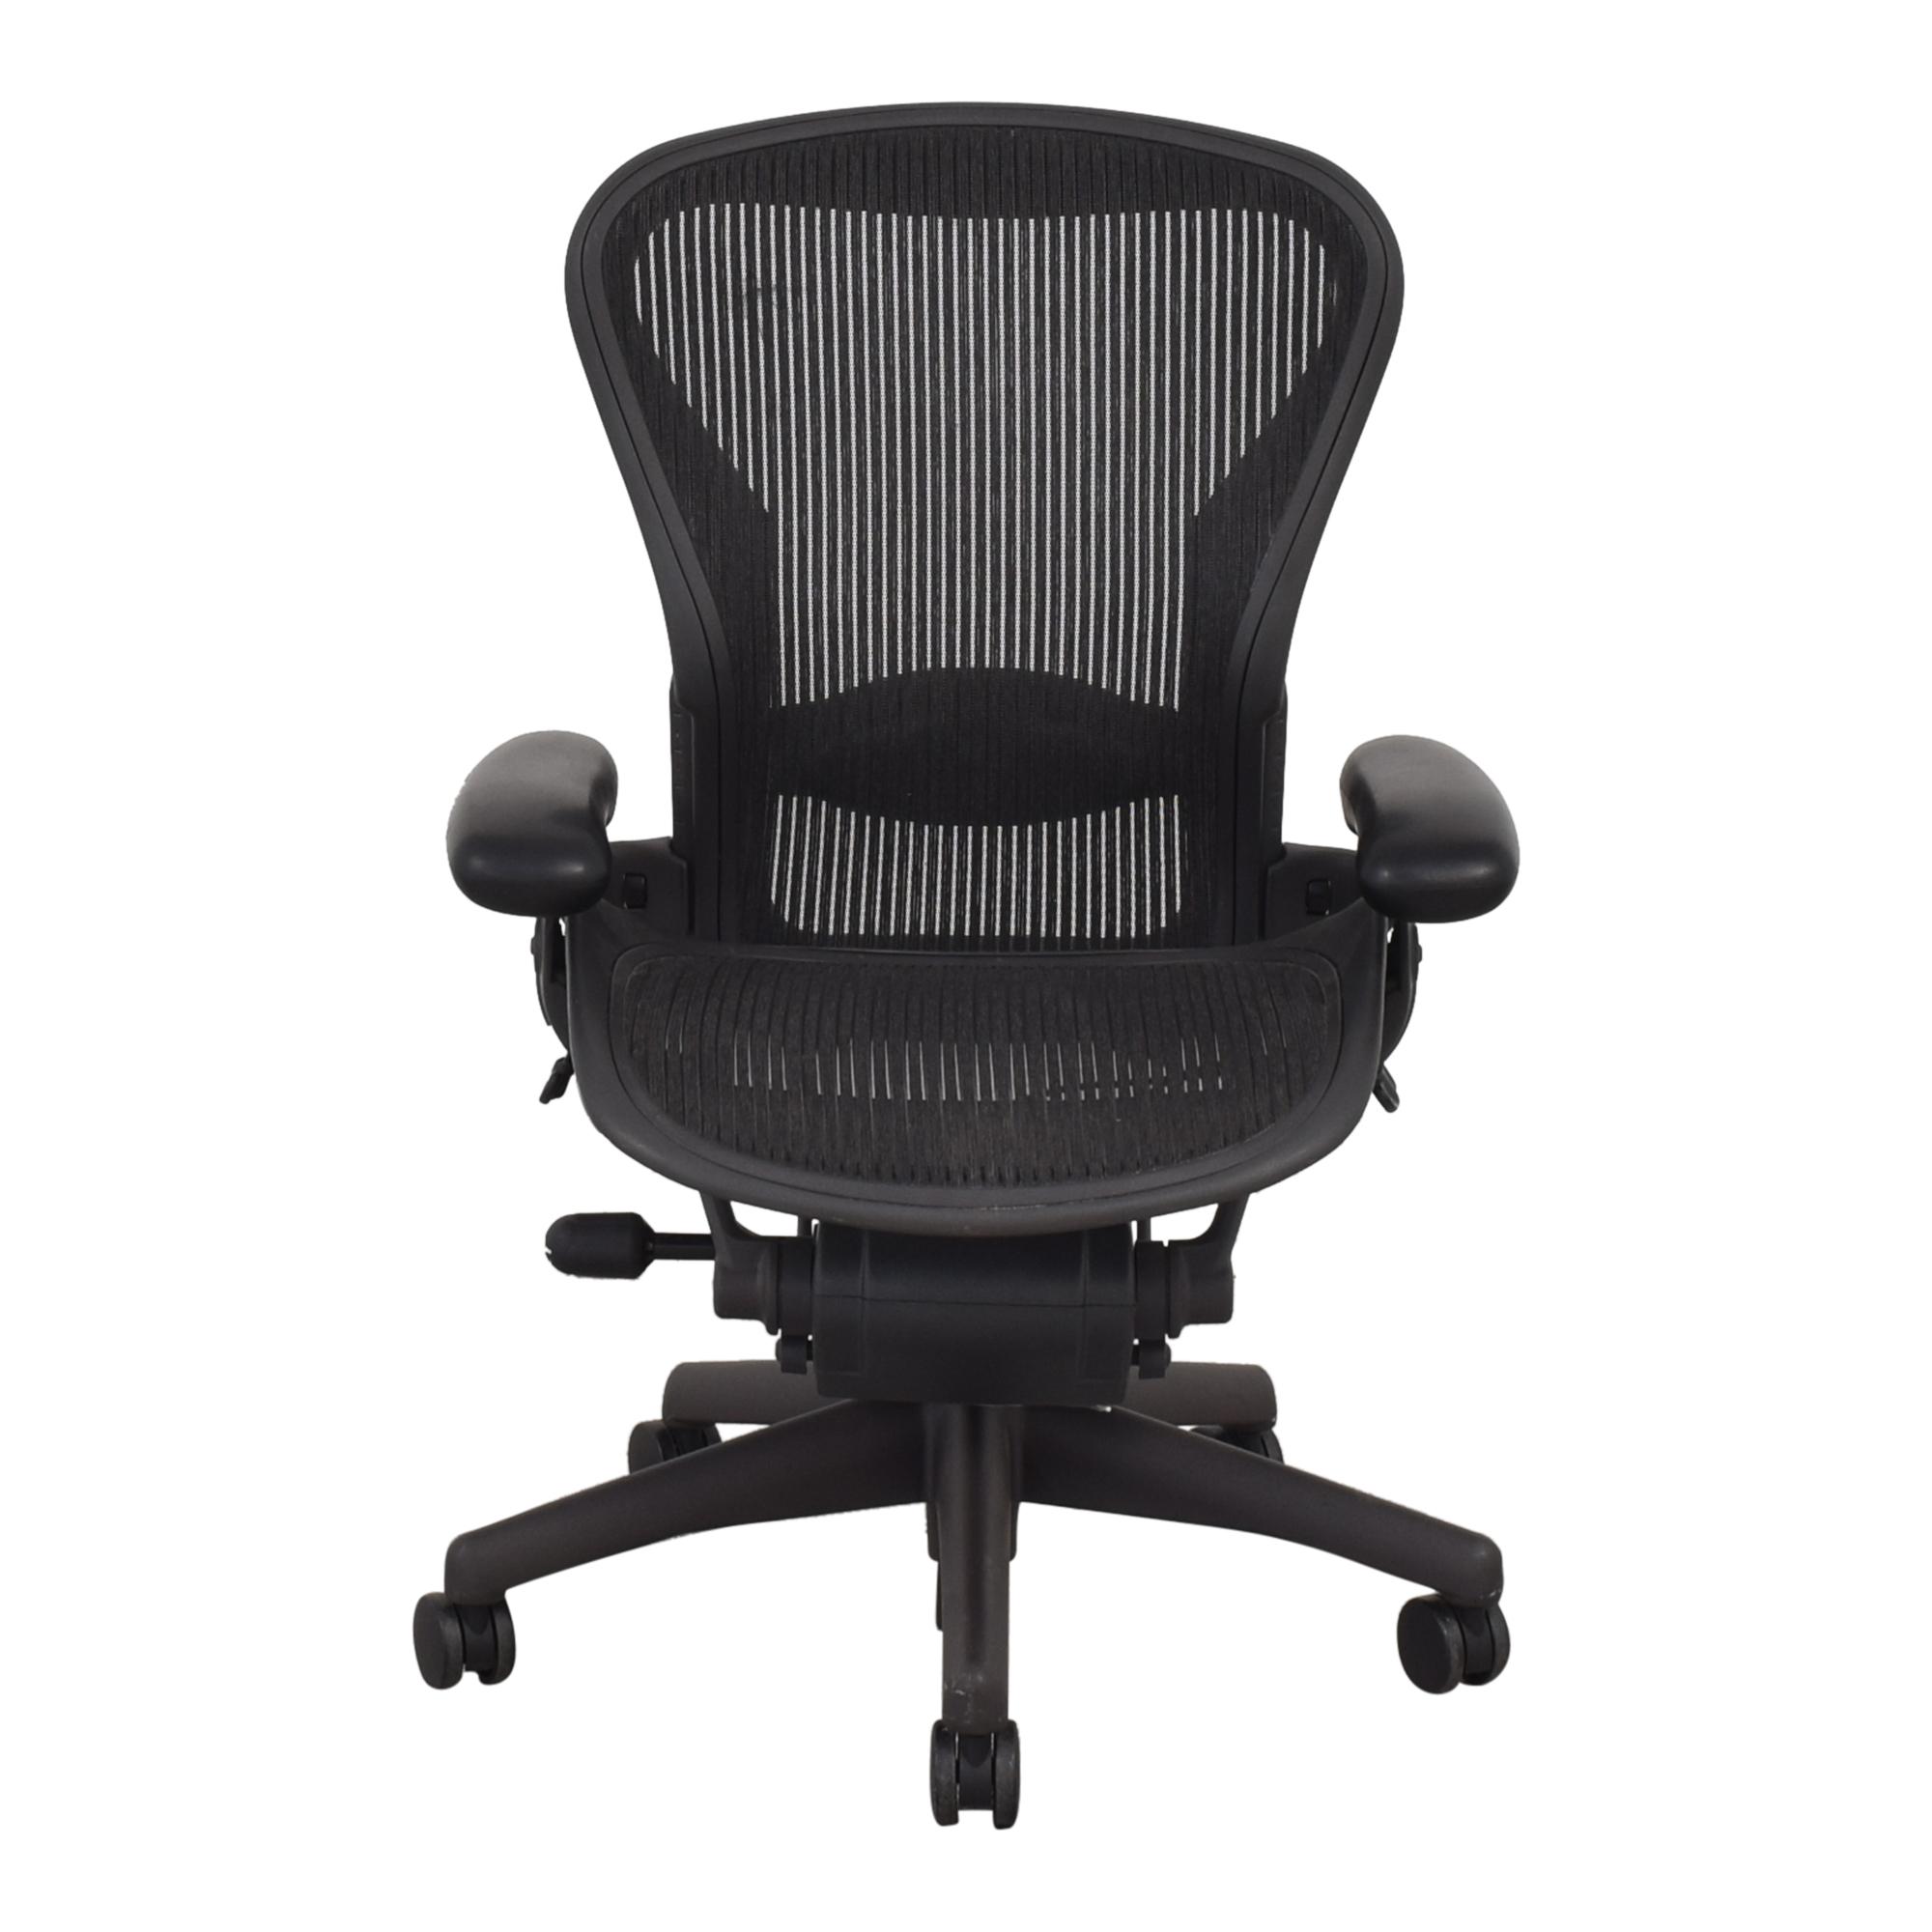 Herman Miller Herman Miller Aeron Chair nyc